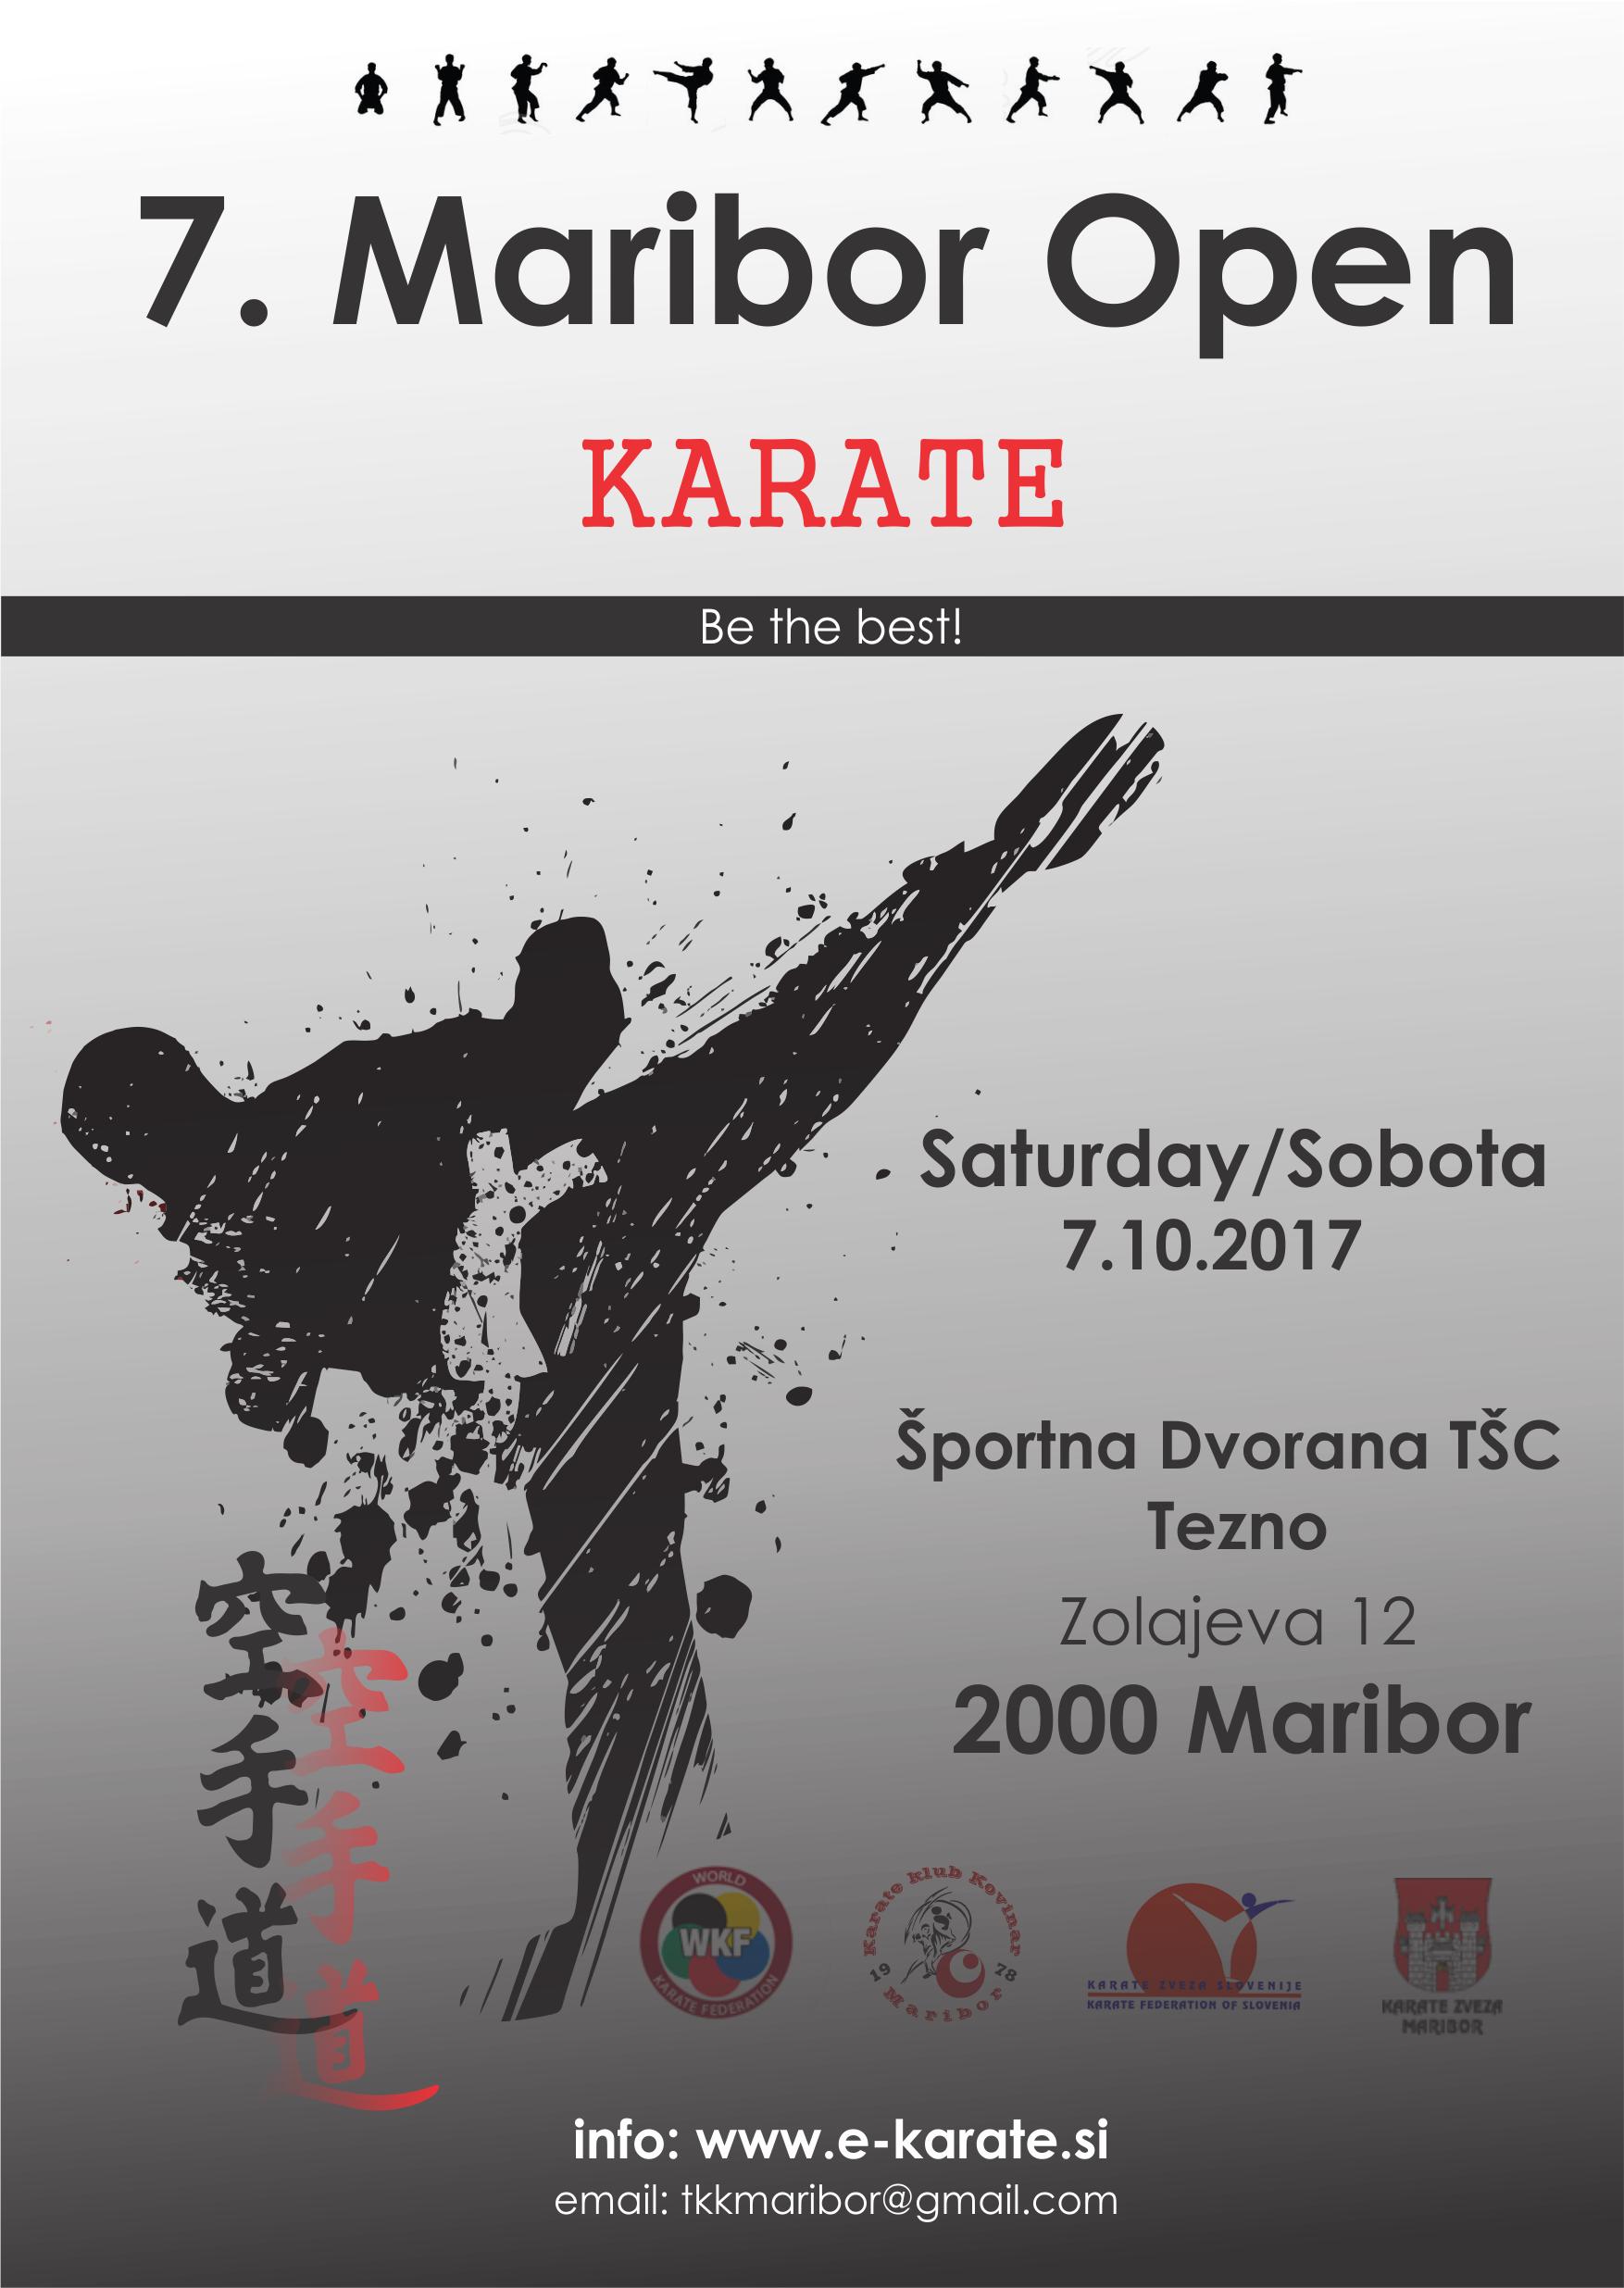 e-Karate.si - MARIBOR OPEN 2017 - Organizator : Karate Klub Kovinar Maribor